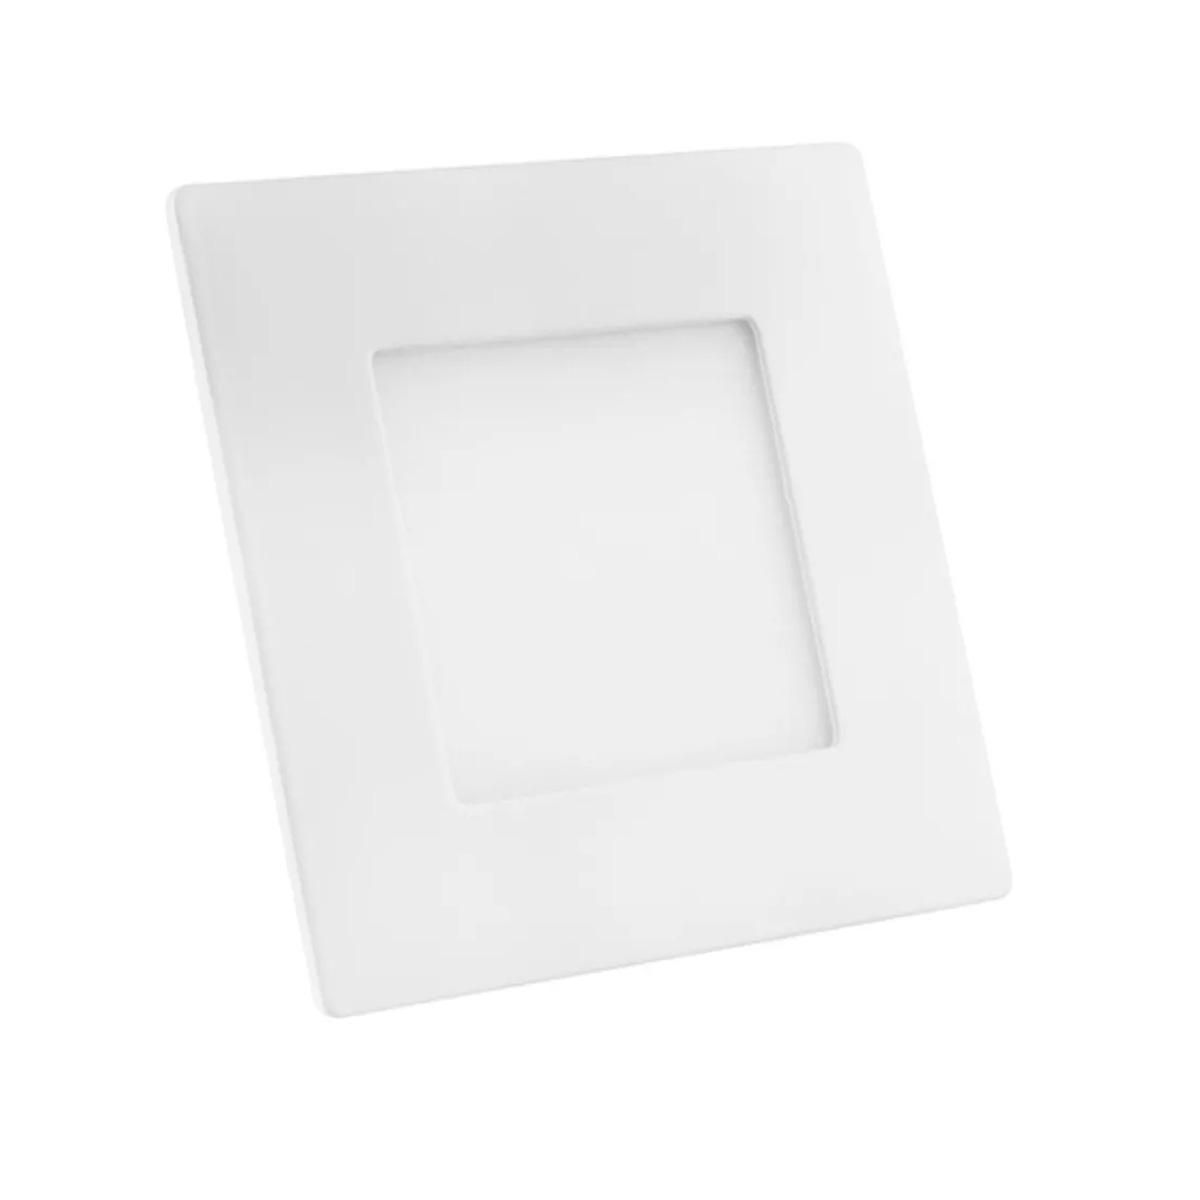 Foco Luminario Led Cuadrado Fijo Luz Blanca 6 W 618092 Iusa